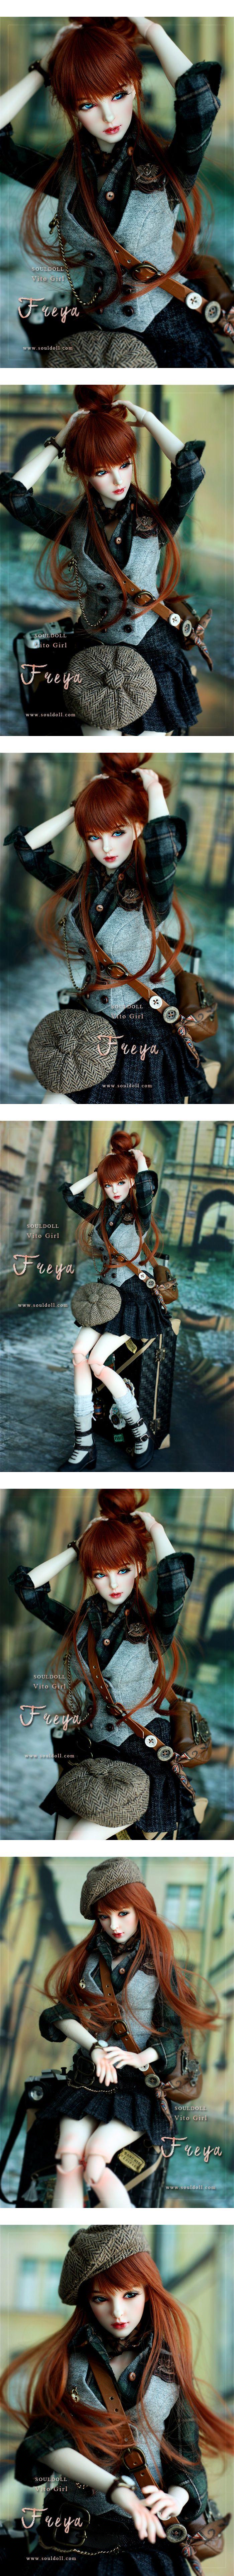 Souldoll Vito girl Freya